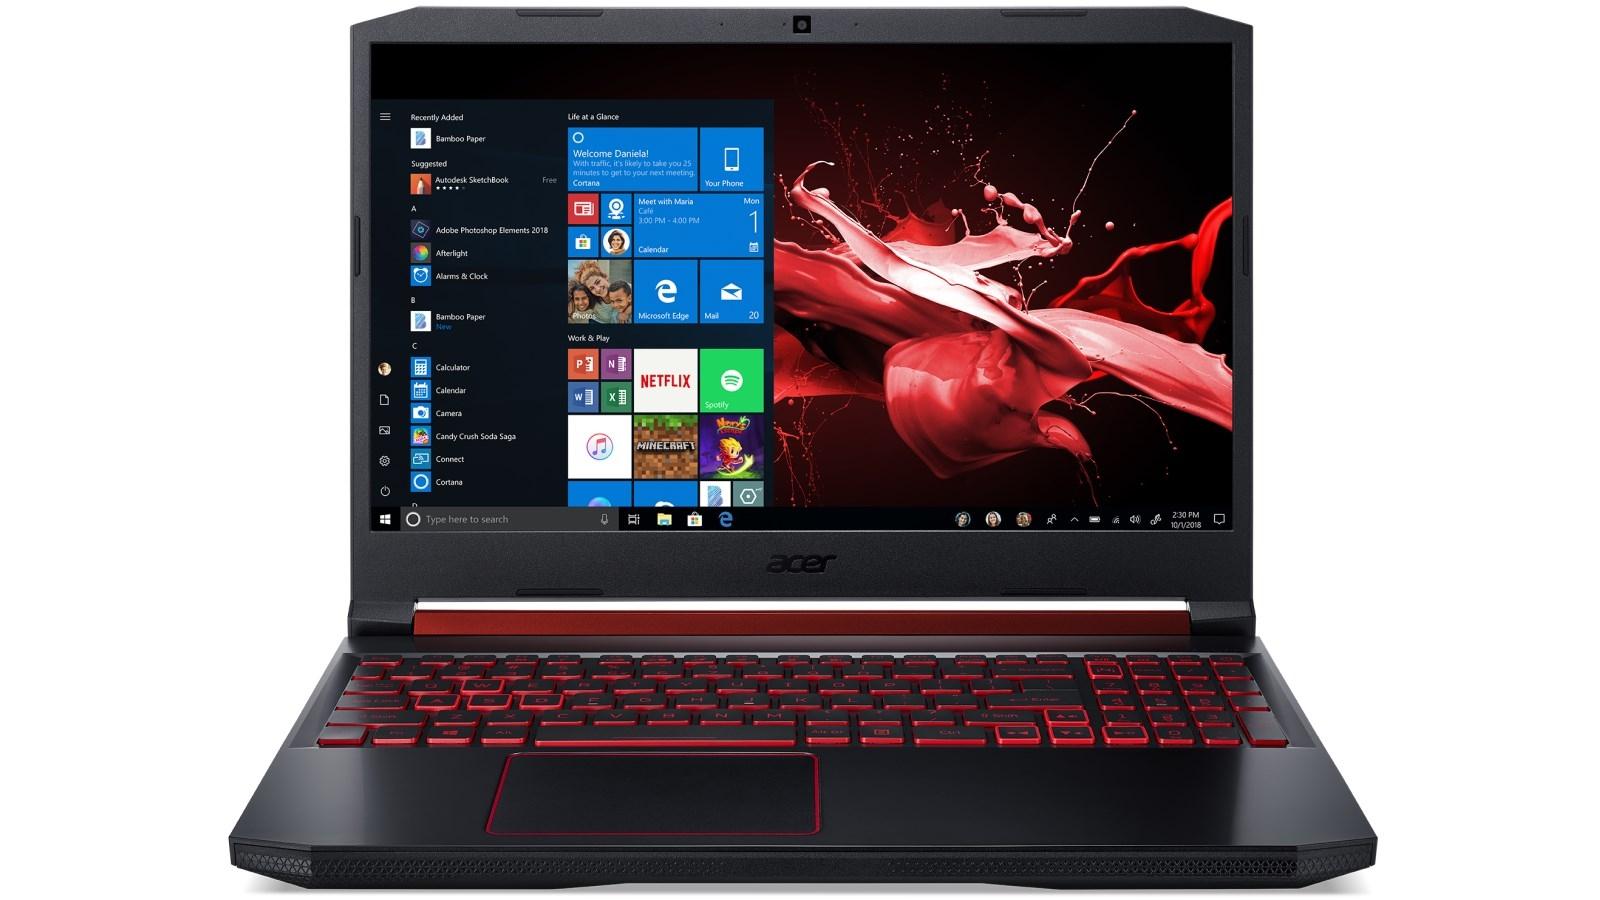 ACER NITRO 5 best gaming laptop